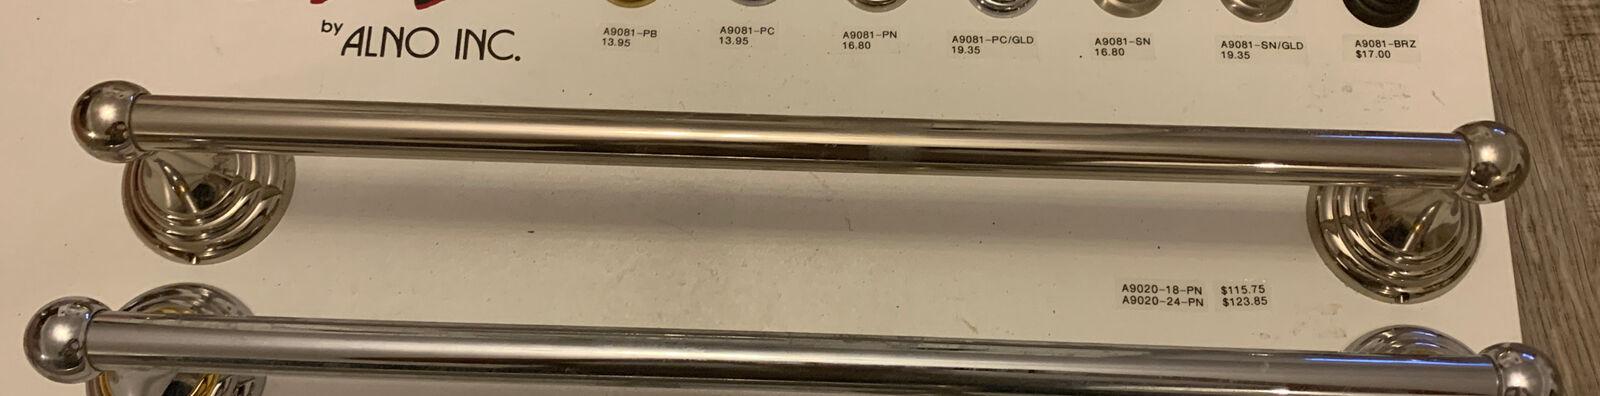 Alno Creations A9020-18-PN Polished Nickel 18 Inch Wide Towel Bar